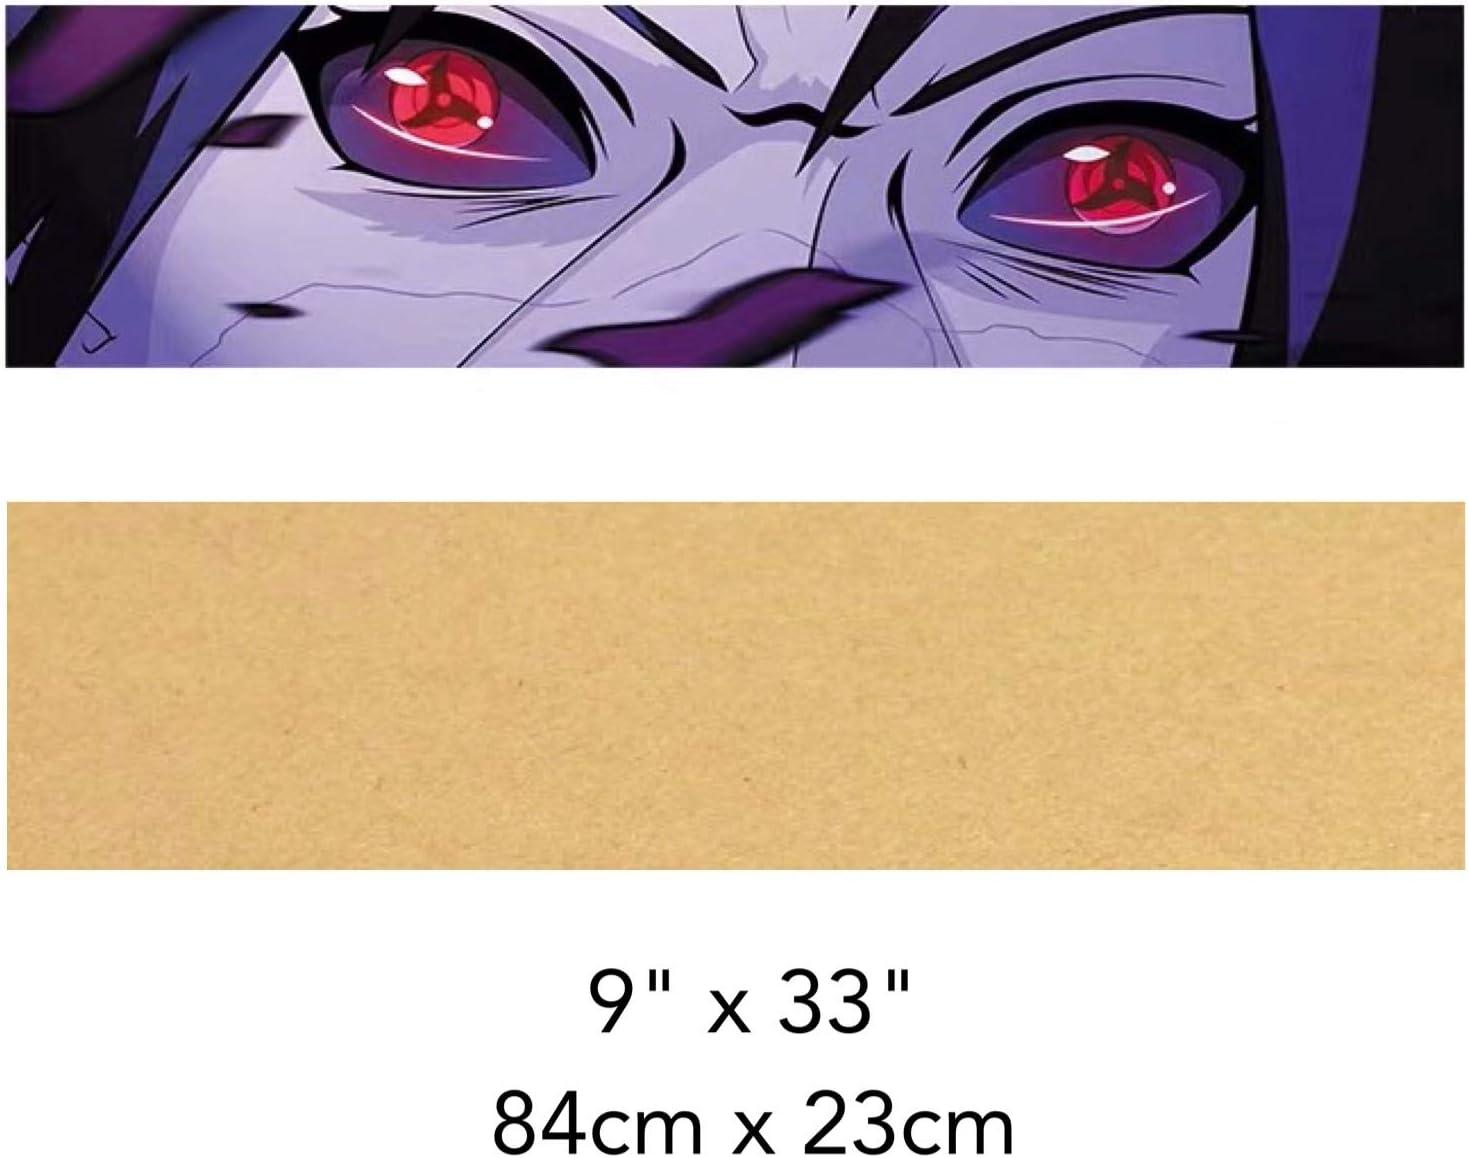 Amazon.com: RAREANT Naruto, Dragon Ball, Skateboard Griptape ...